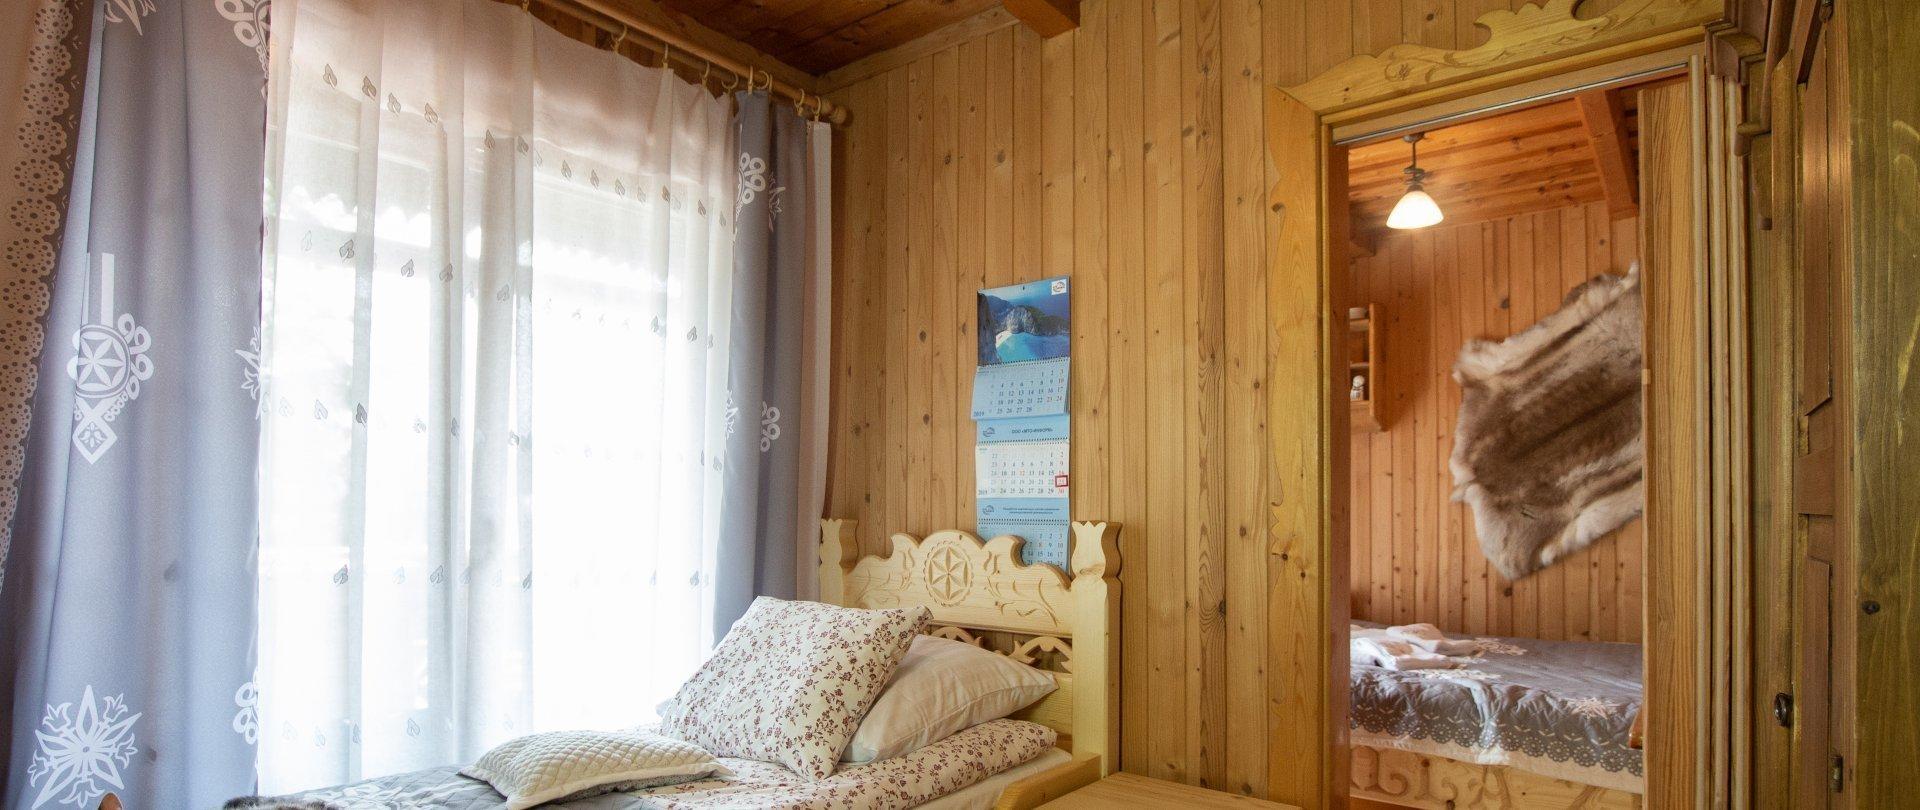 Residenzkammer 1- Zimmer von Oma Cesia